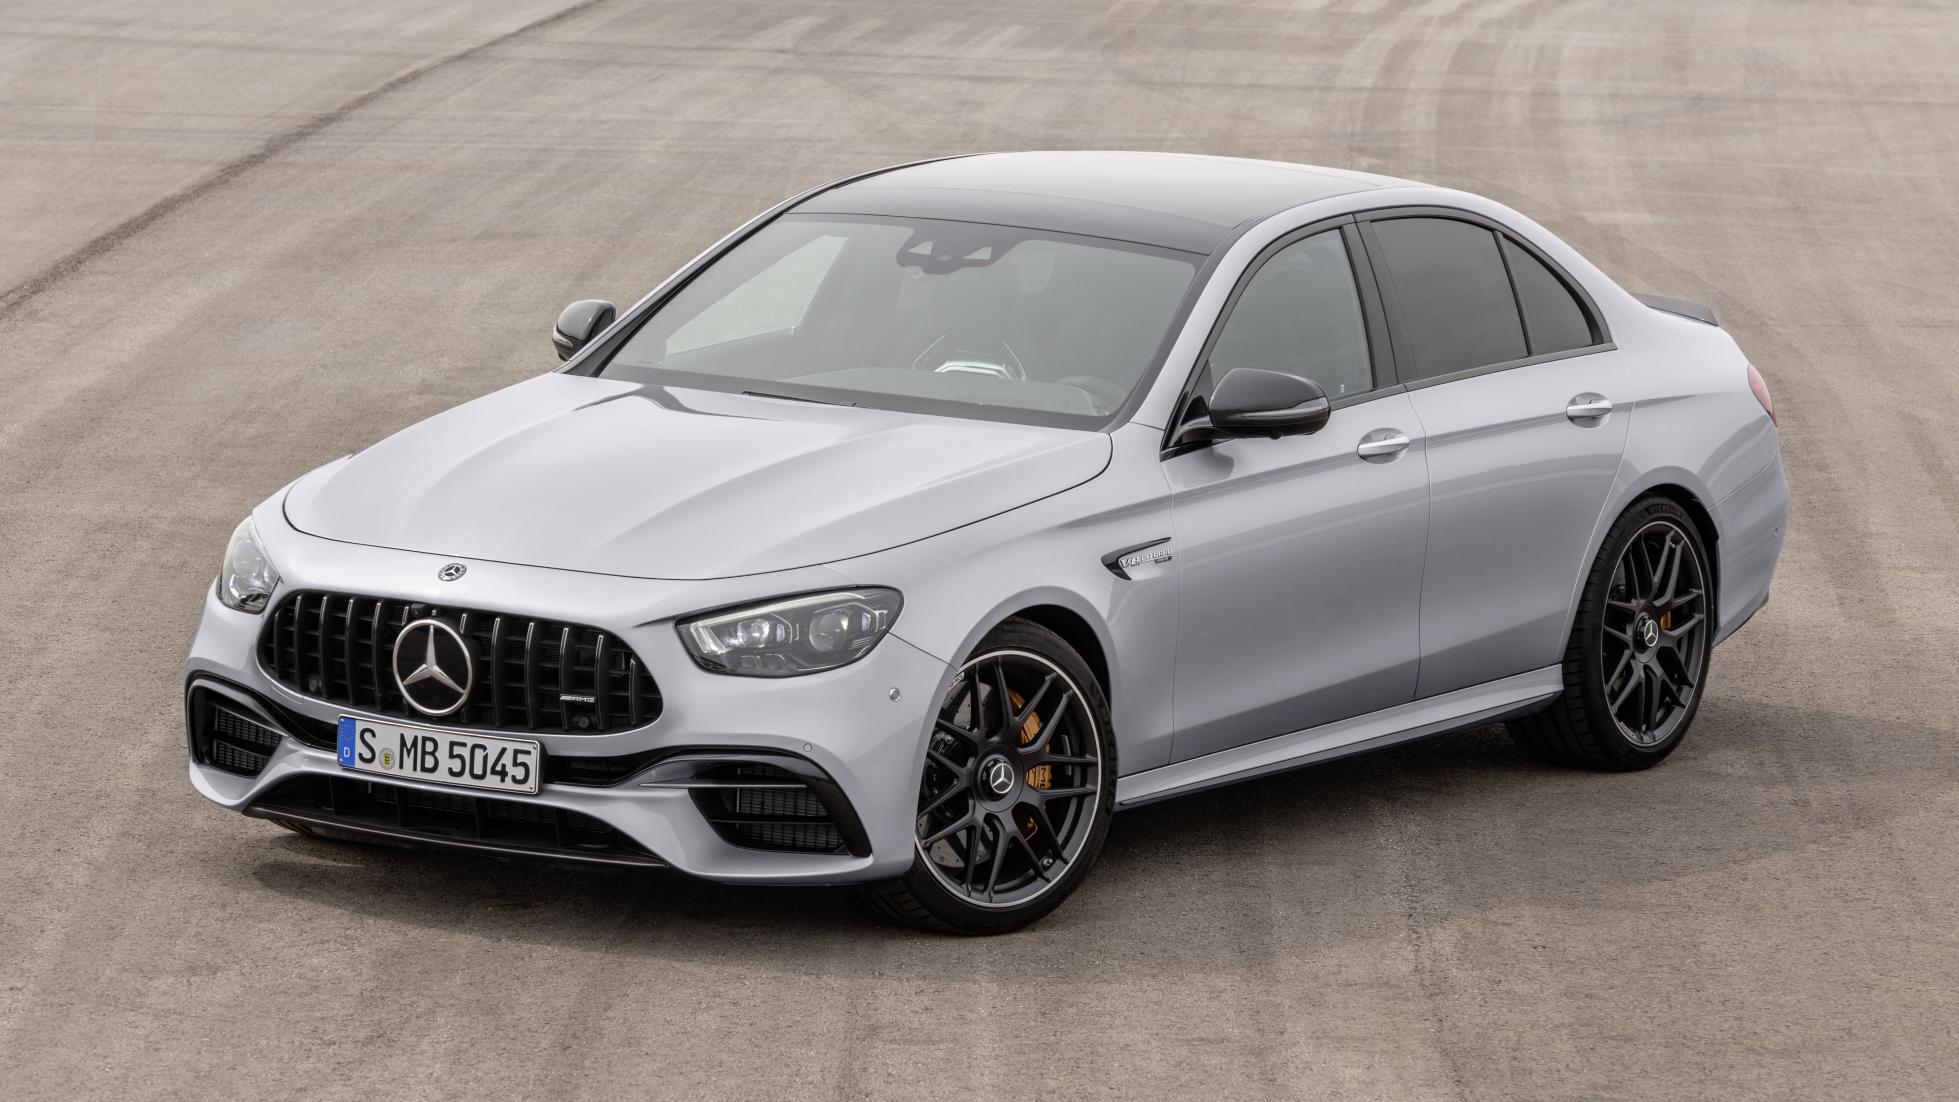 Mercedes-AMG E 63 S Facelift (2020)